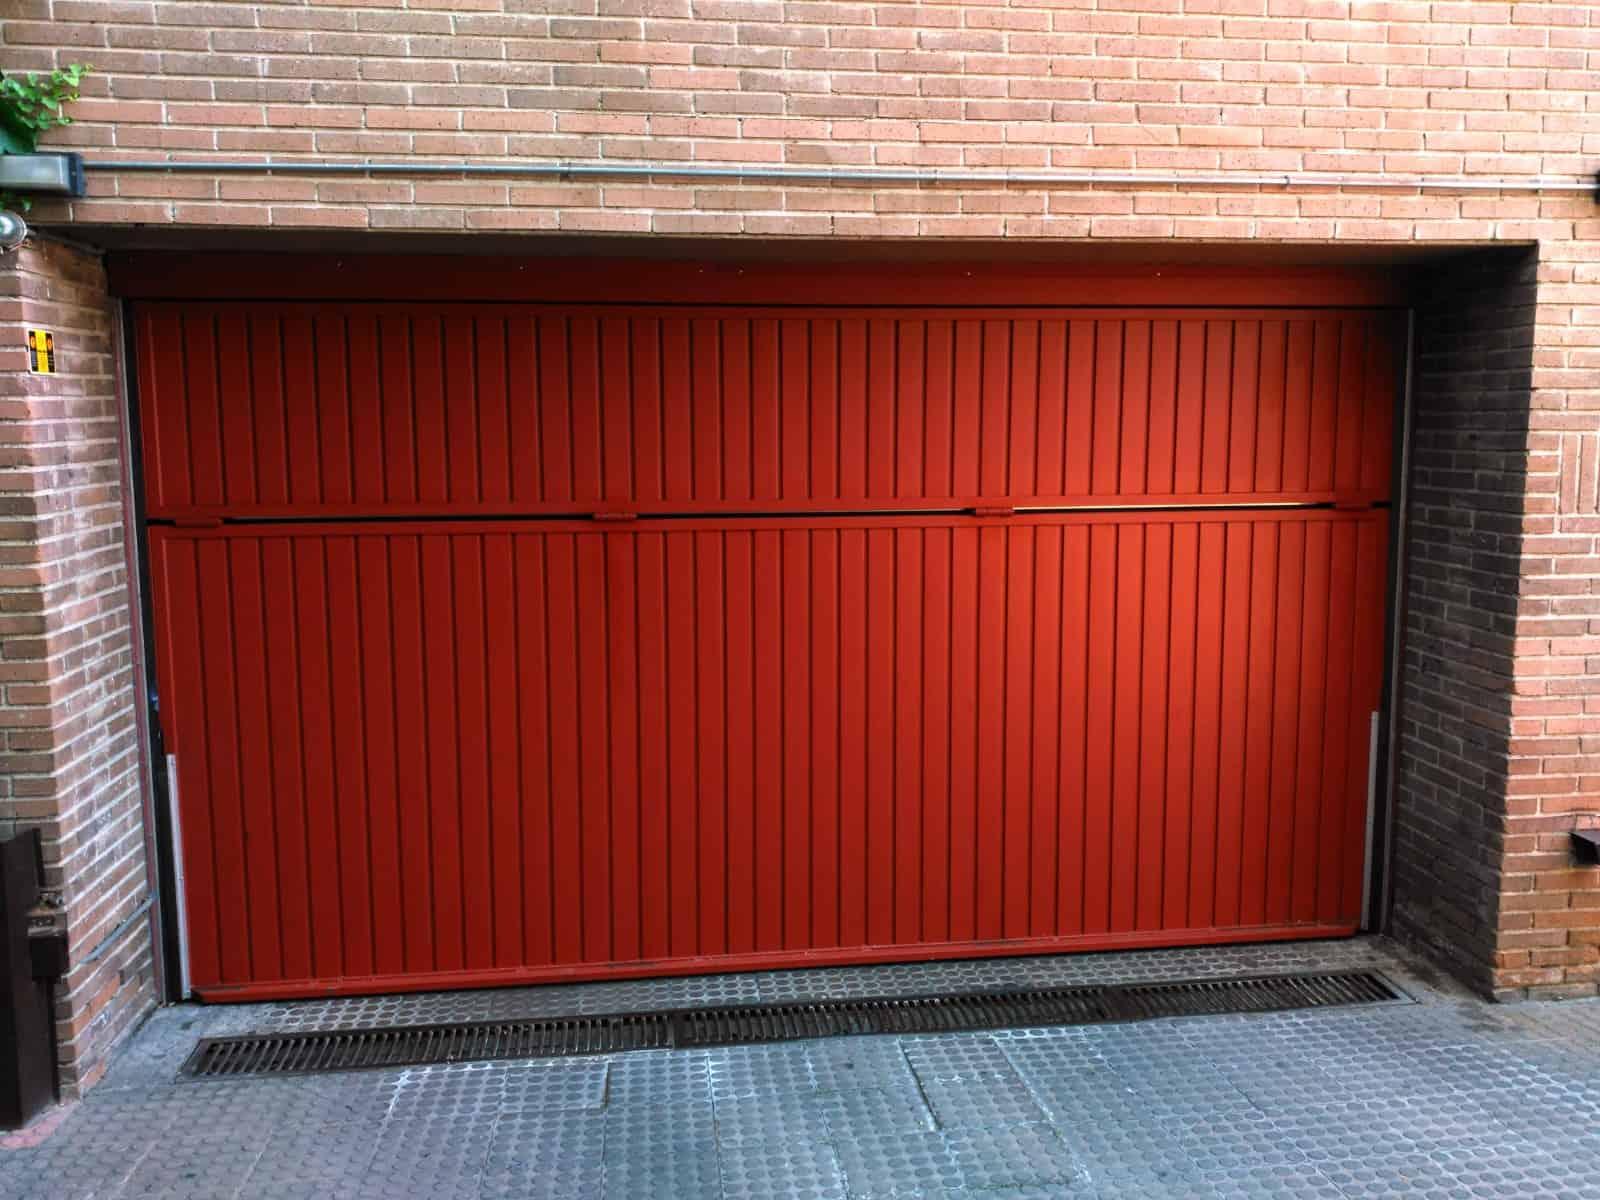 Qué puerta poner en mi garaje - Hergoy Cerrajeros